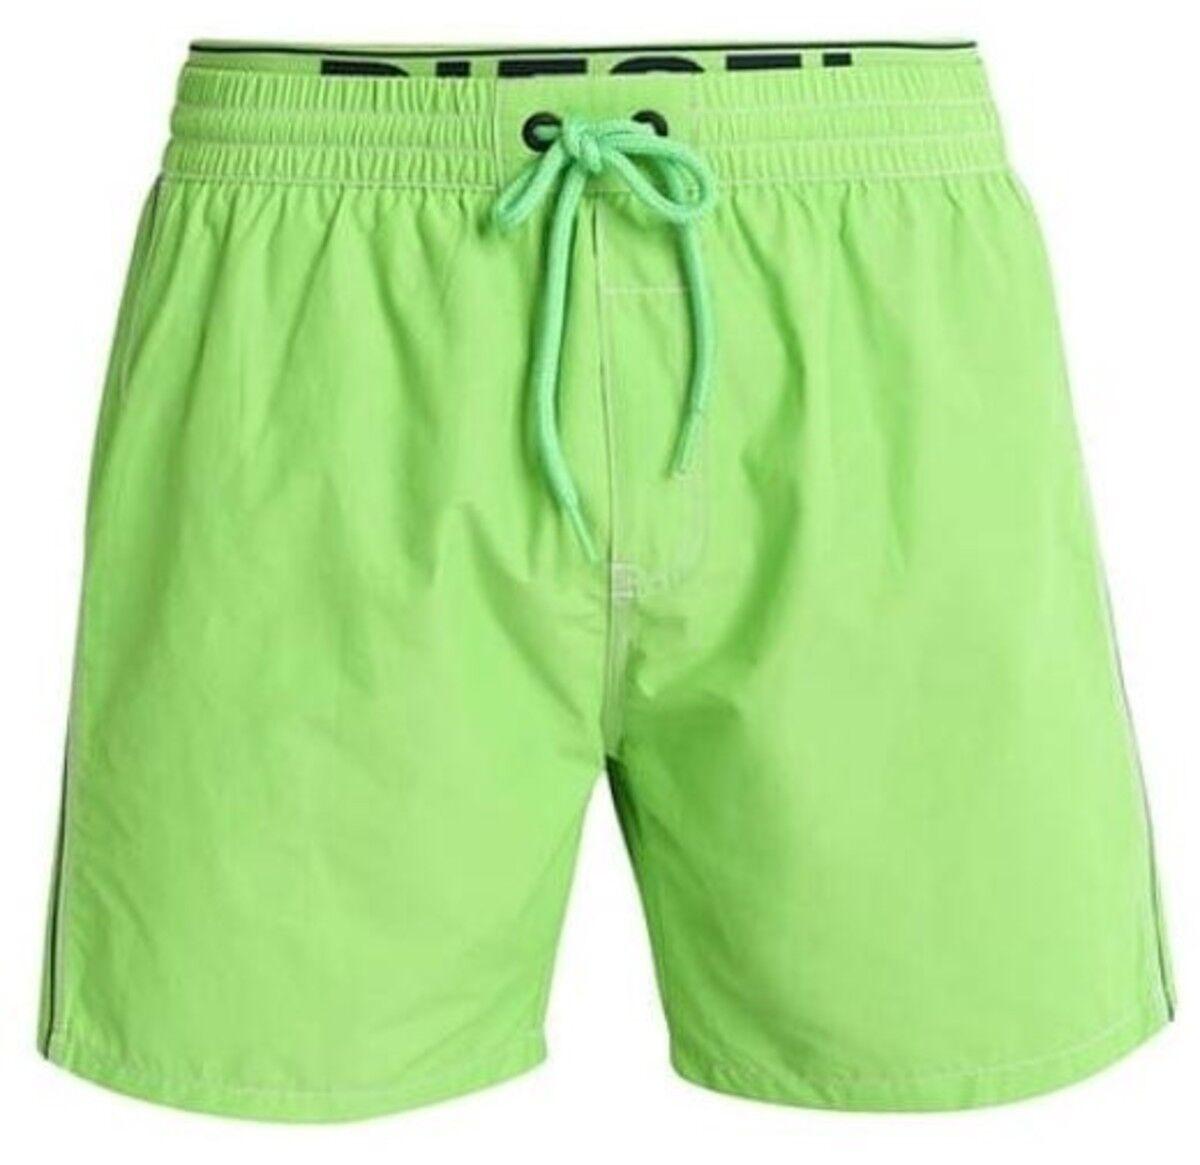 DIESEL Beachwear 'Dolphin 2' Men's Swim   Bathing Trunks Board Shorts L Lime NWT